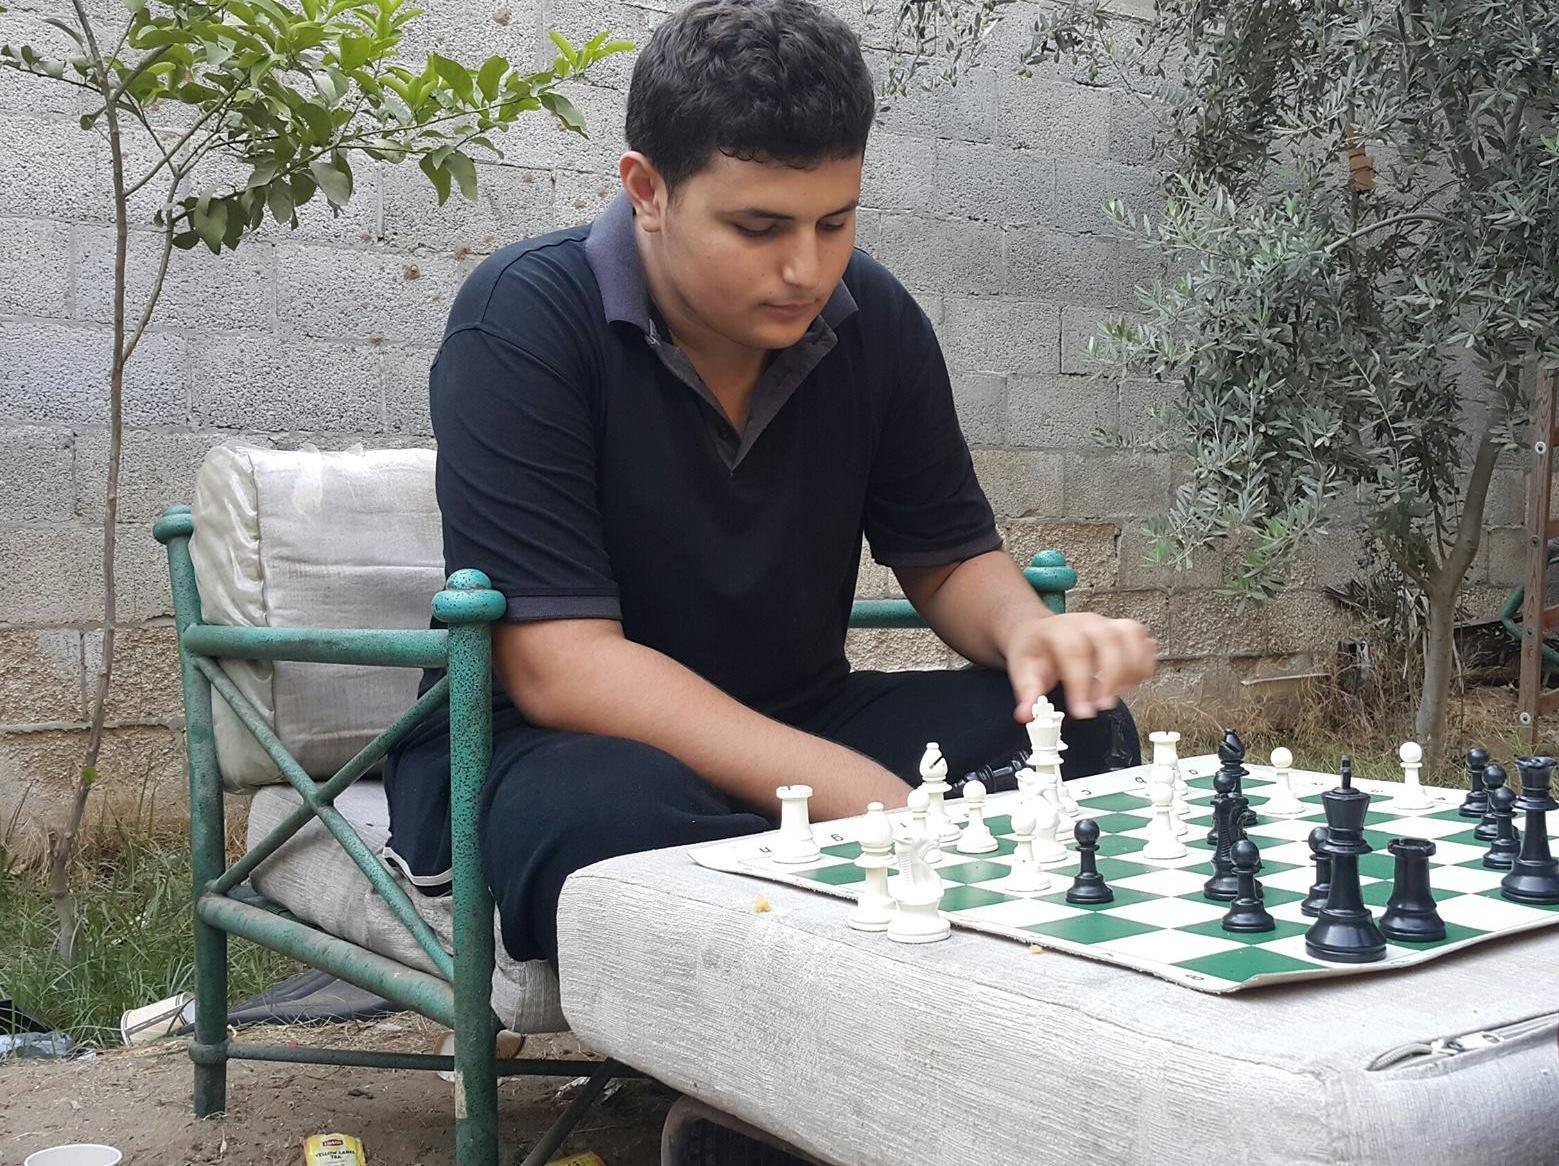 Bashar playing chess